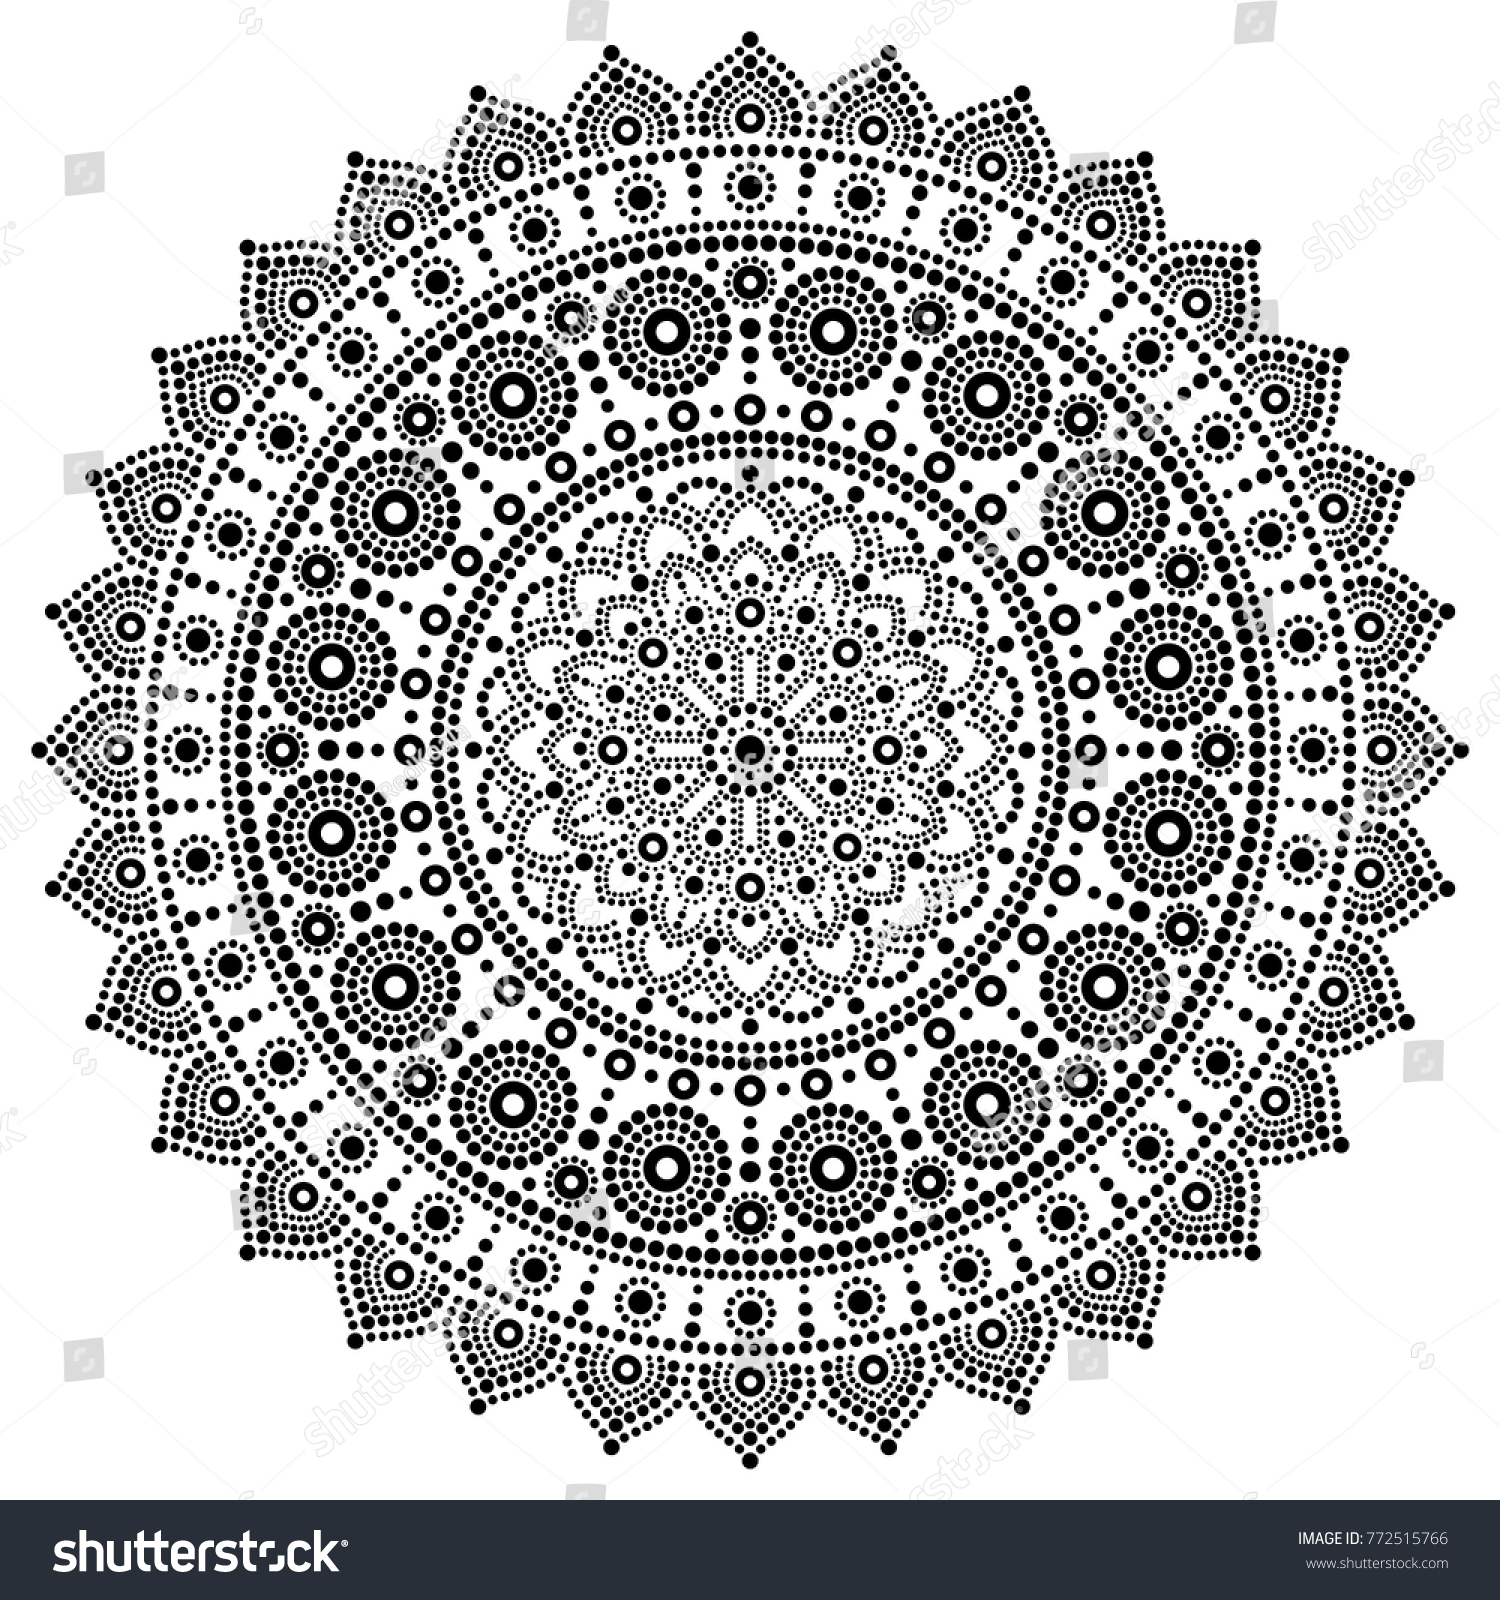 Mandala Vector Monochrome Design Aboriginal Dot Painting Style Australian Folk Art Boho